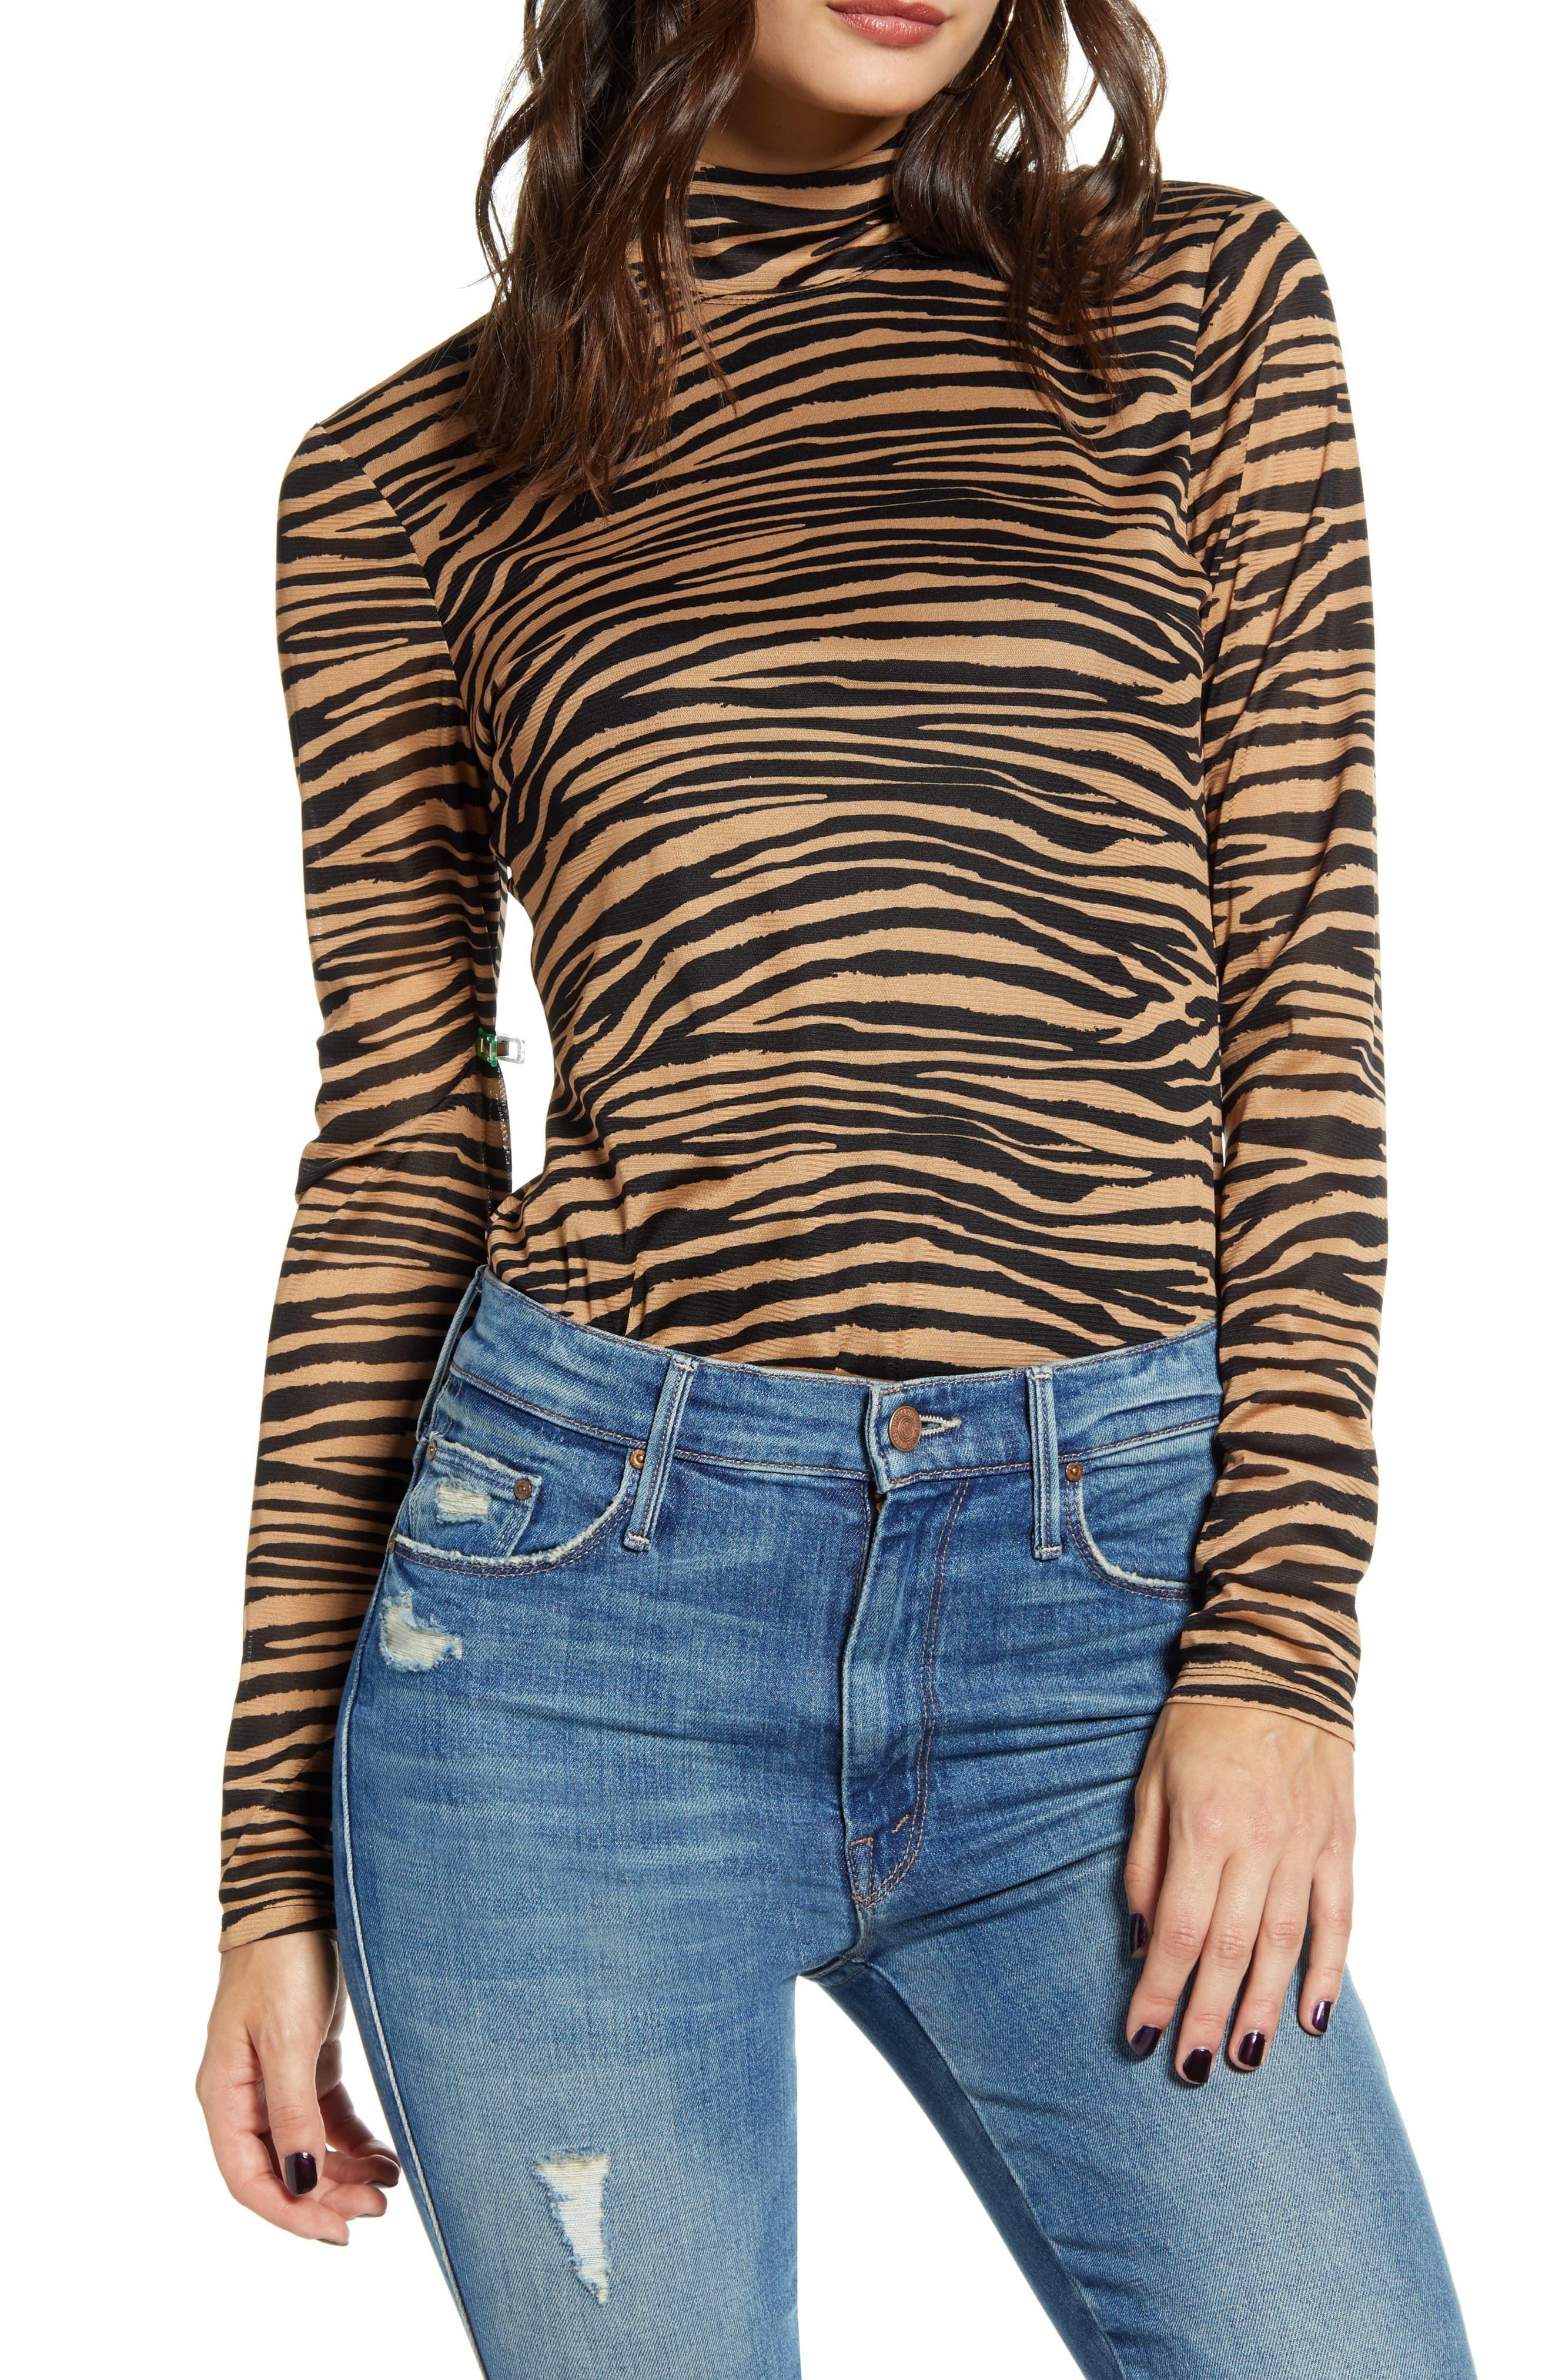 WAYF Jett Tiger Stripe Mock Neck Knit Top | Fashion, Stylish